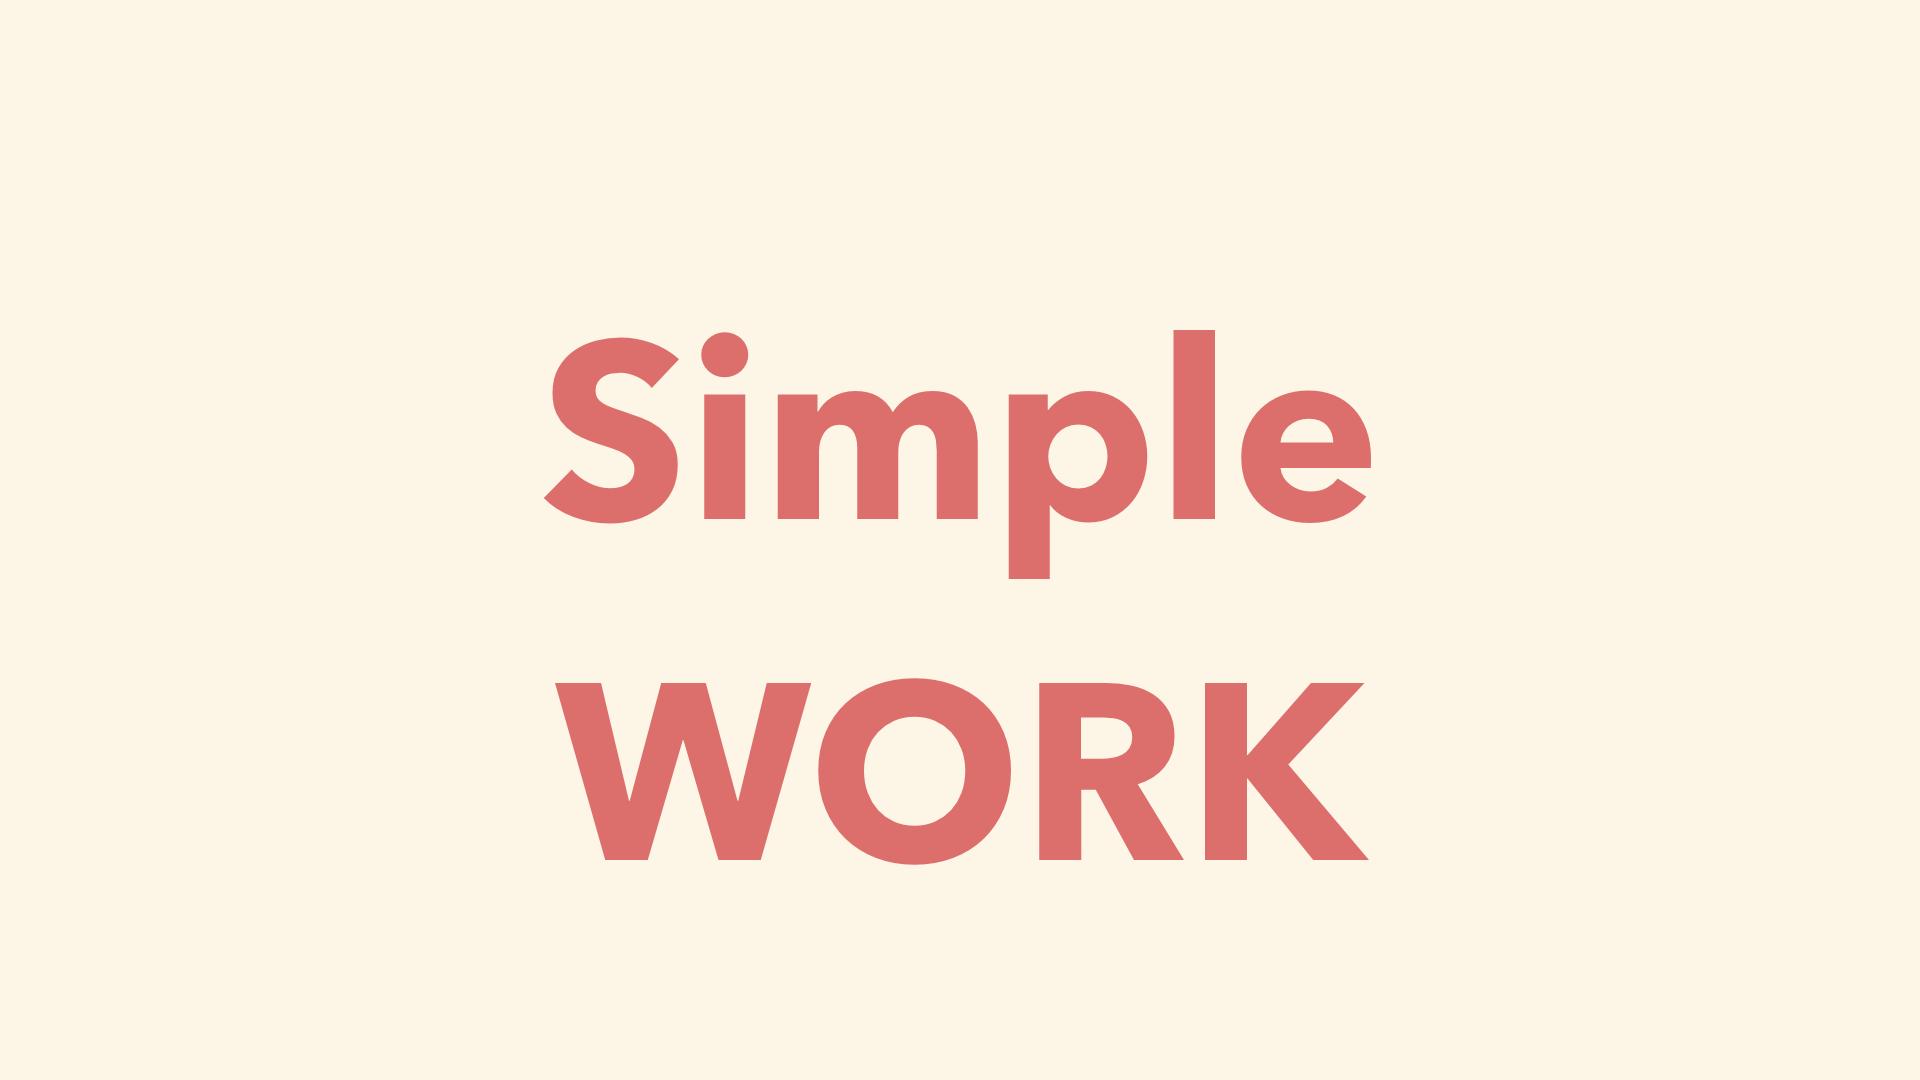 simplework